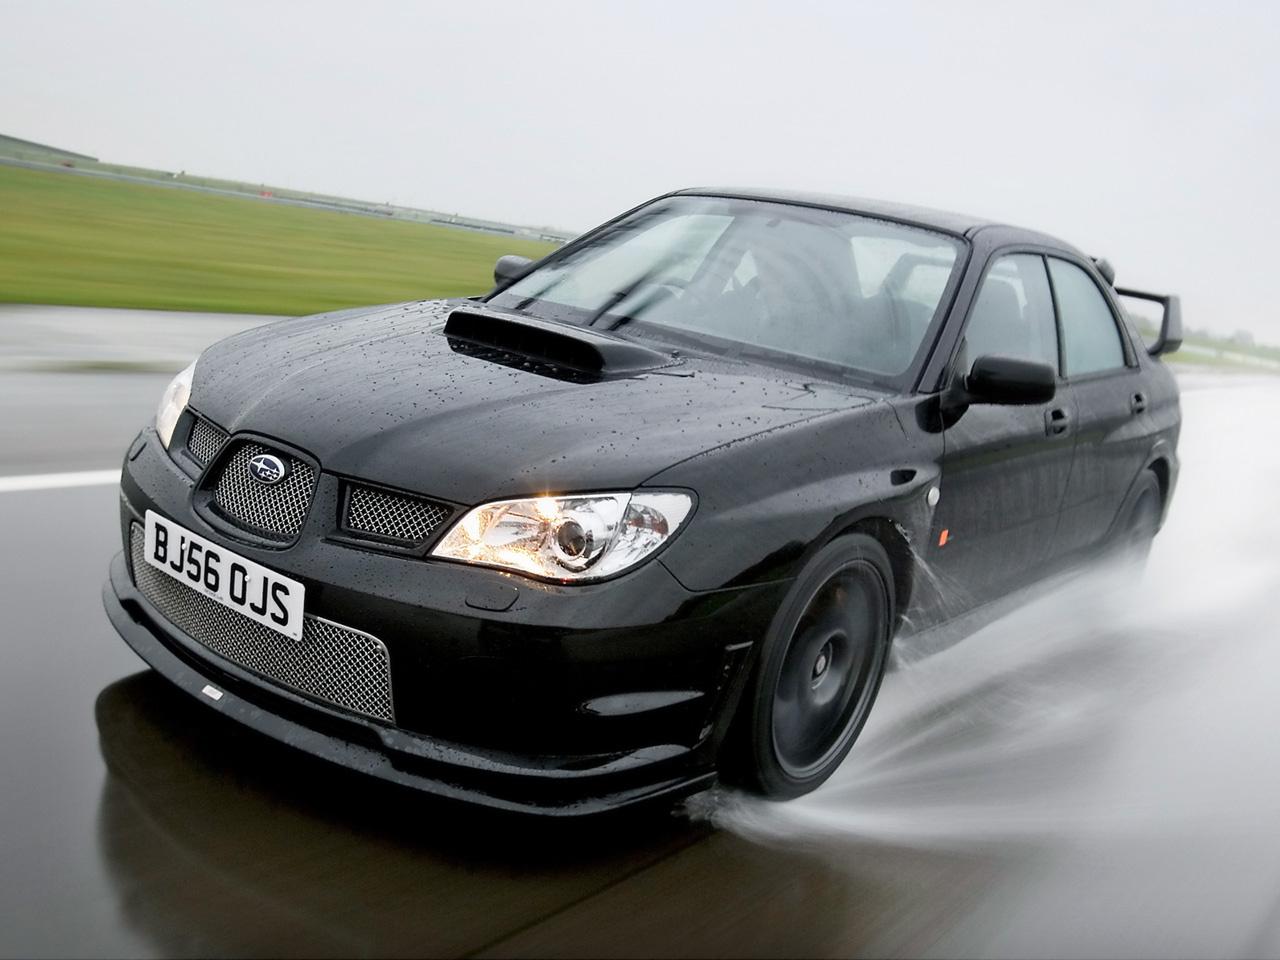 2007 Subaru Impreza Wrx >> 2007 Subaru Impreza Wrx Sti Overview Cargurus